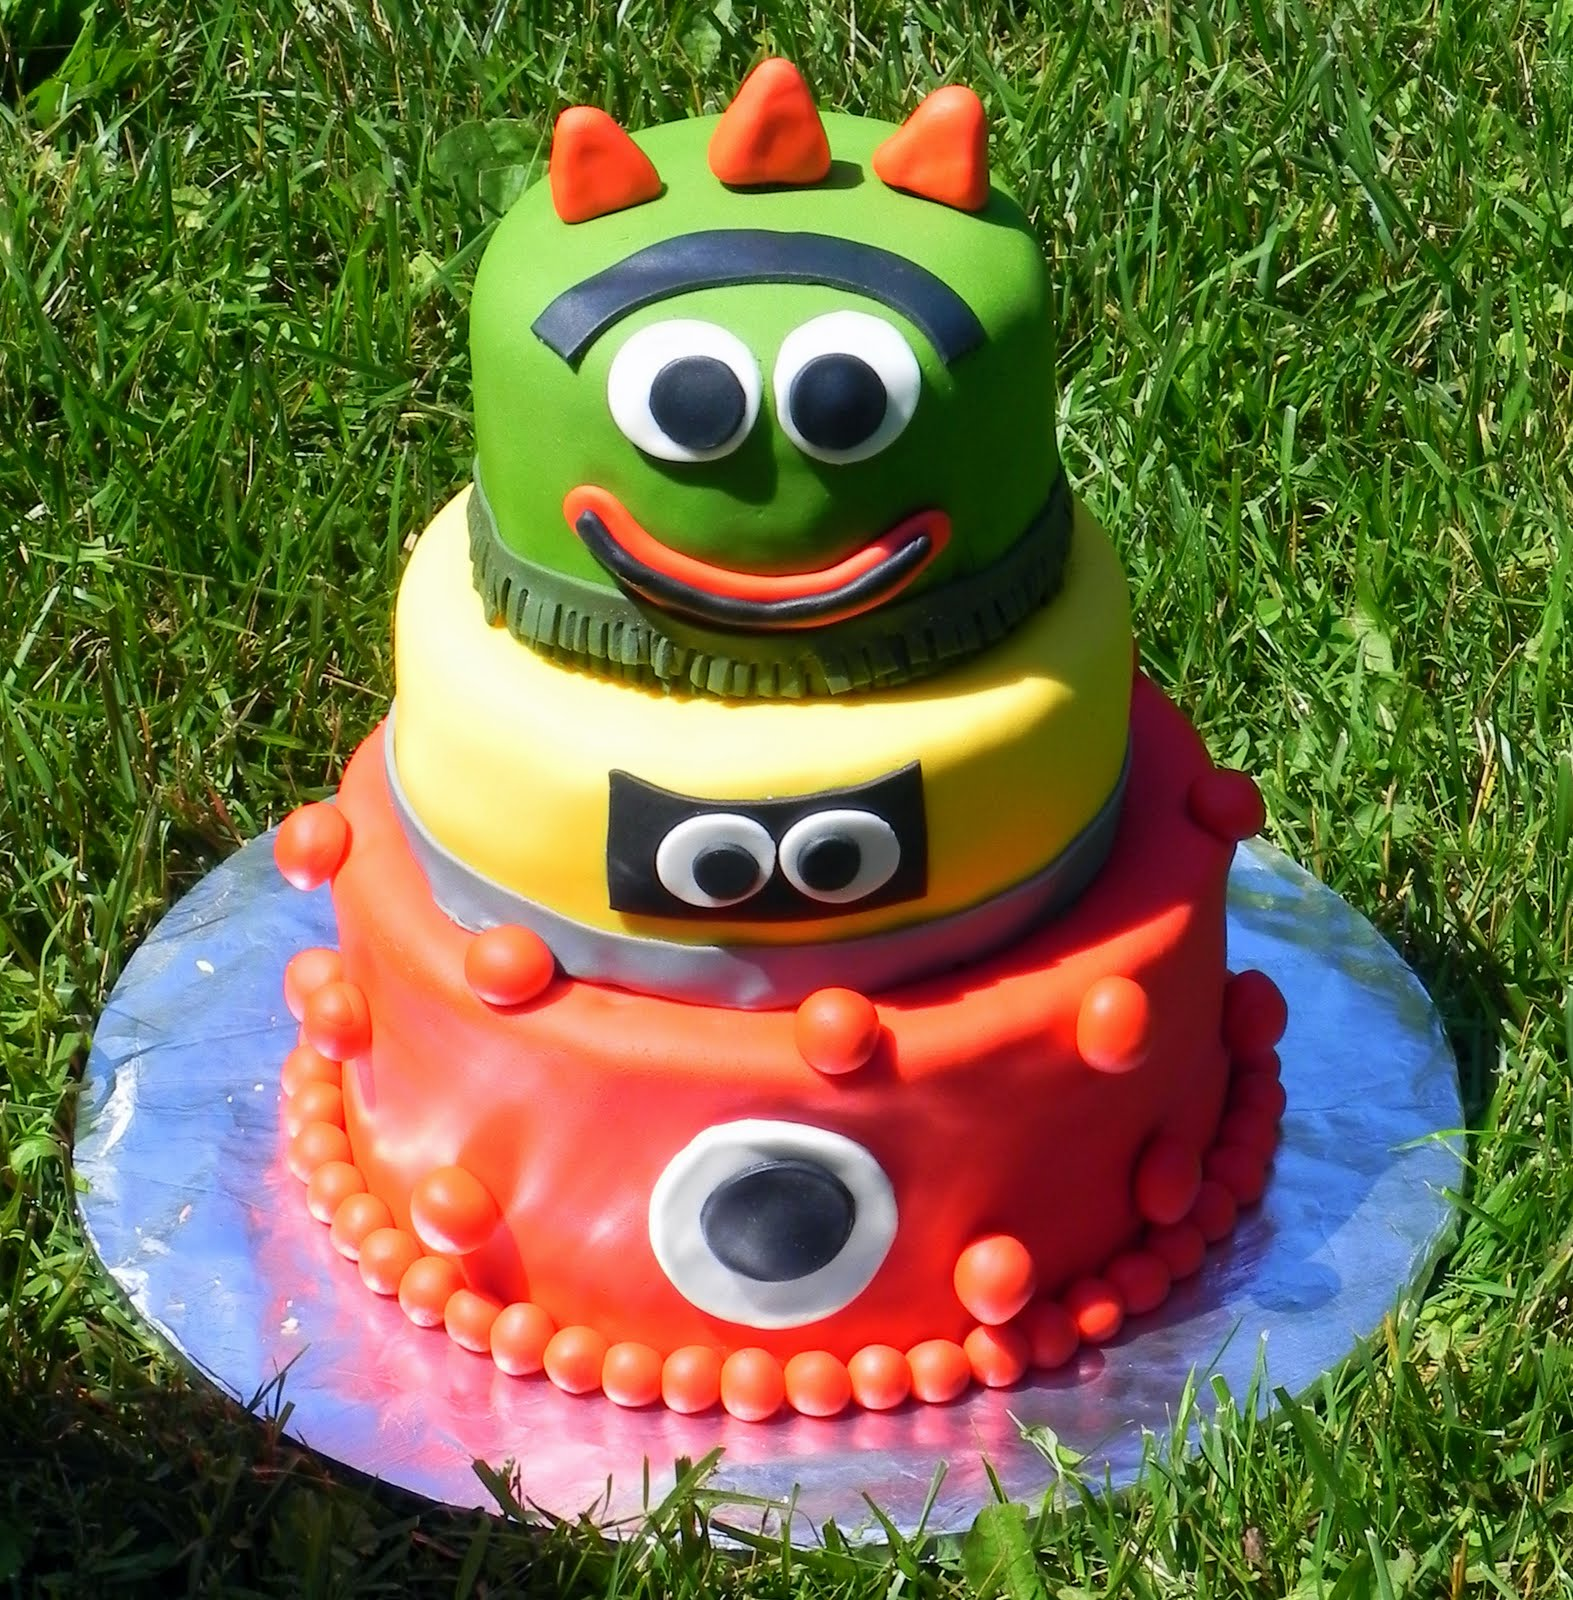 Yo gabba cake photo sharing Rainbow Swirl Cake Recipe In Katrina's Kitchen